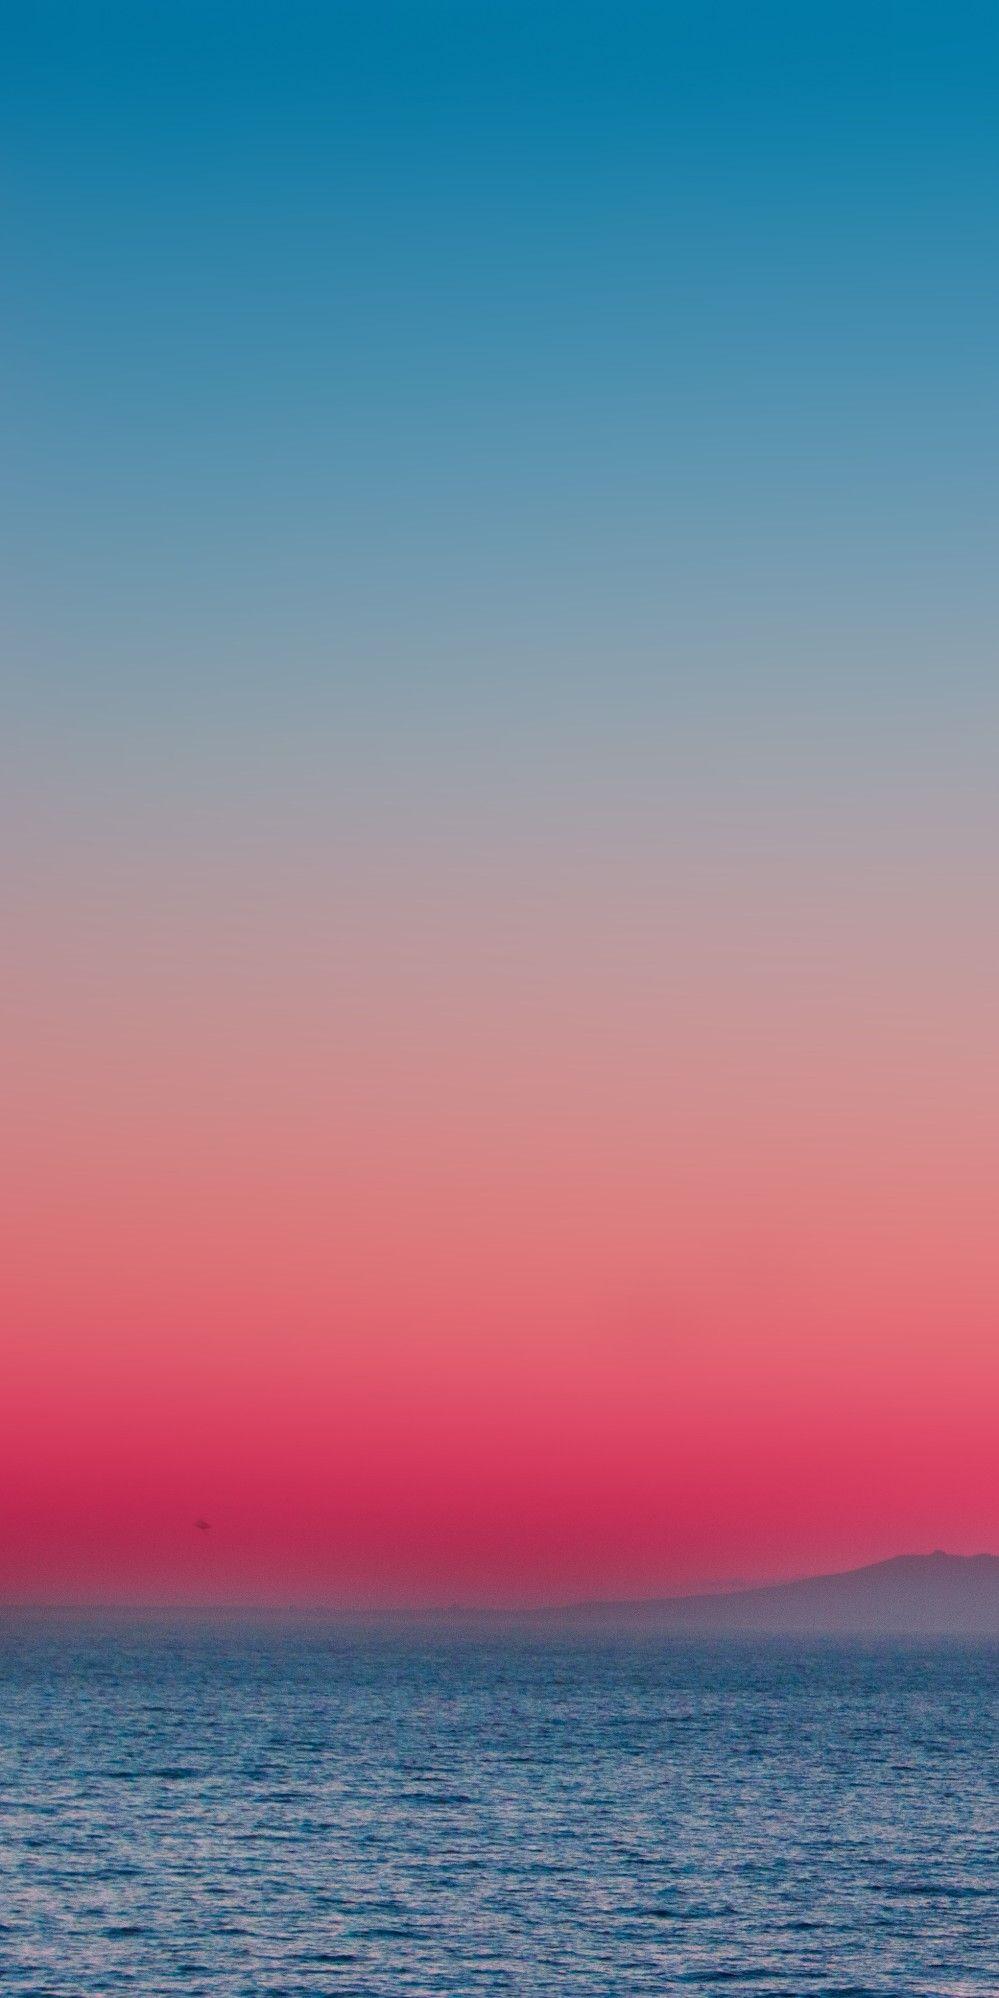 Wallpaper Photography Of Sky And Sea Watercolor Desktop